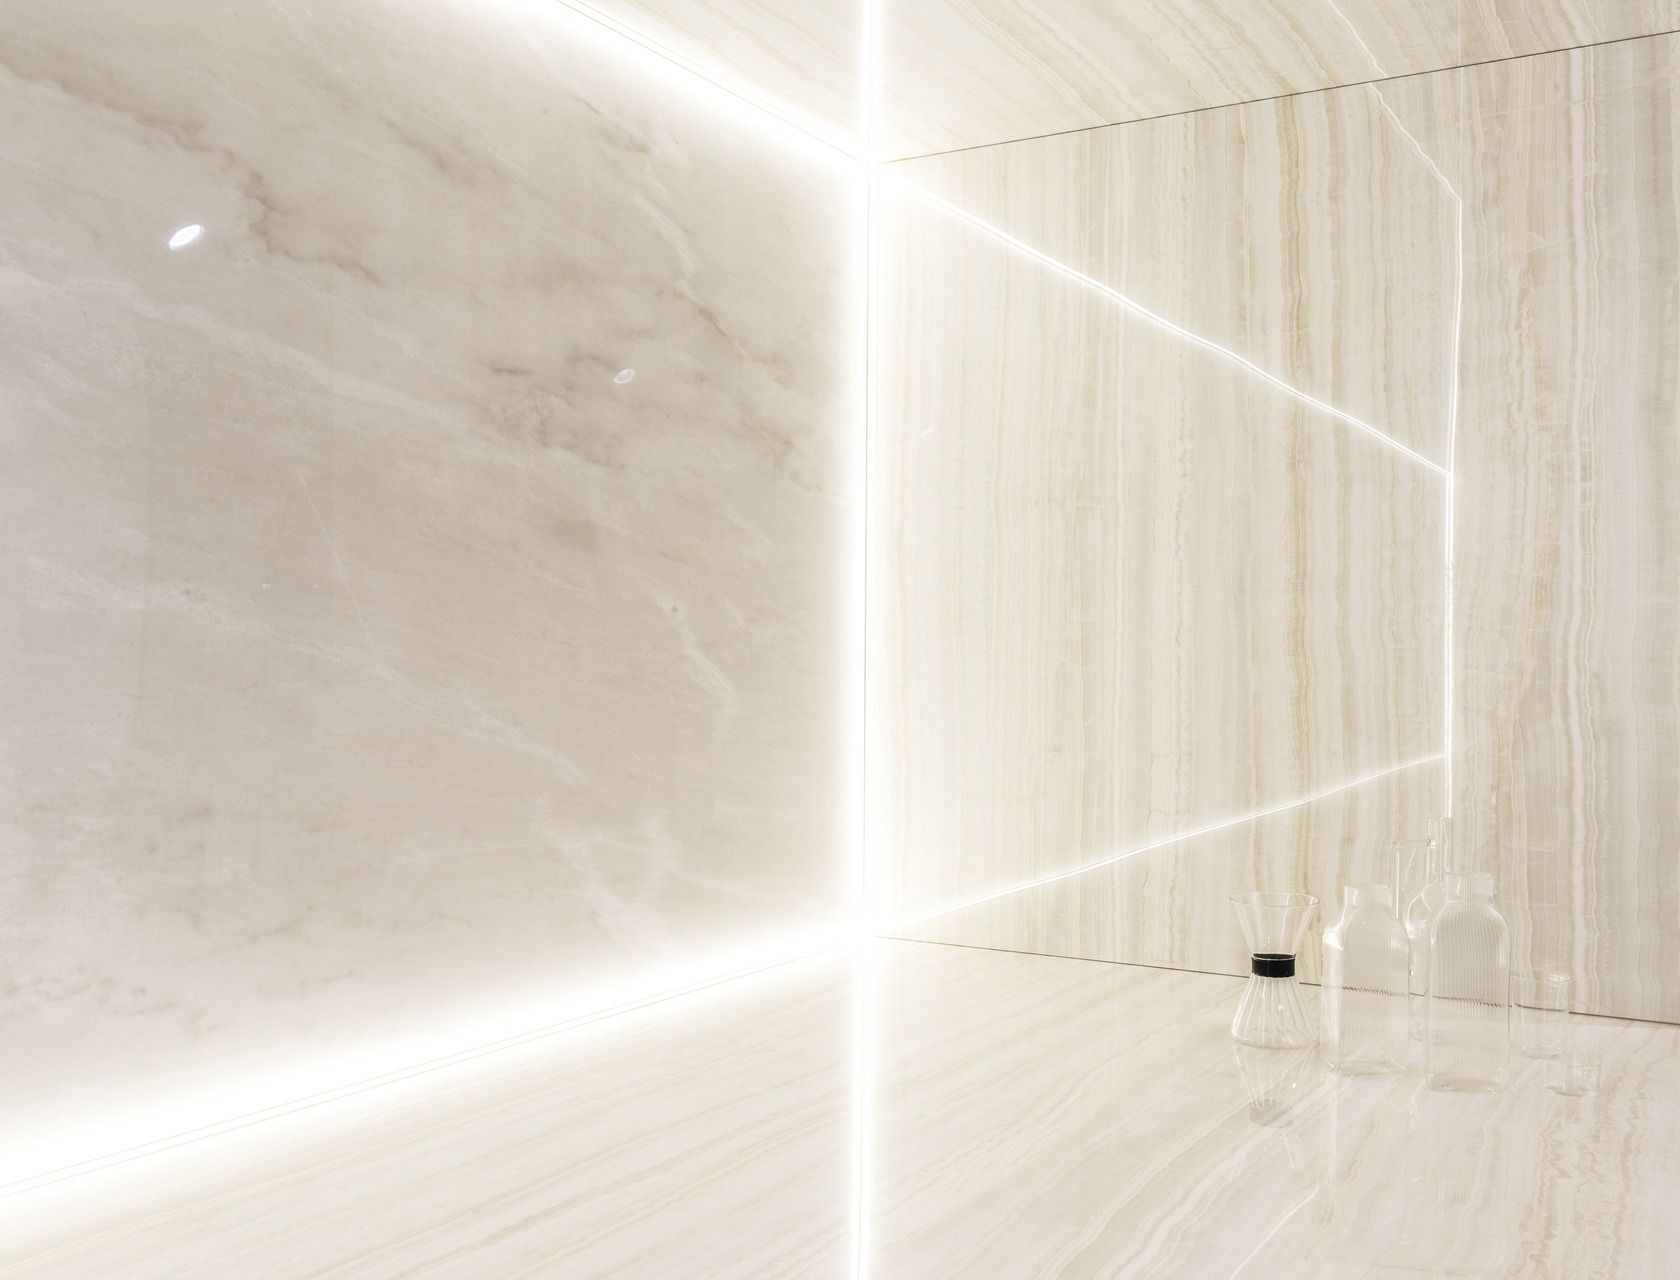 Onice ivory Marmi cento7cento, white marble effect porcelain tiles